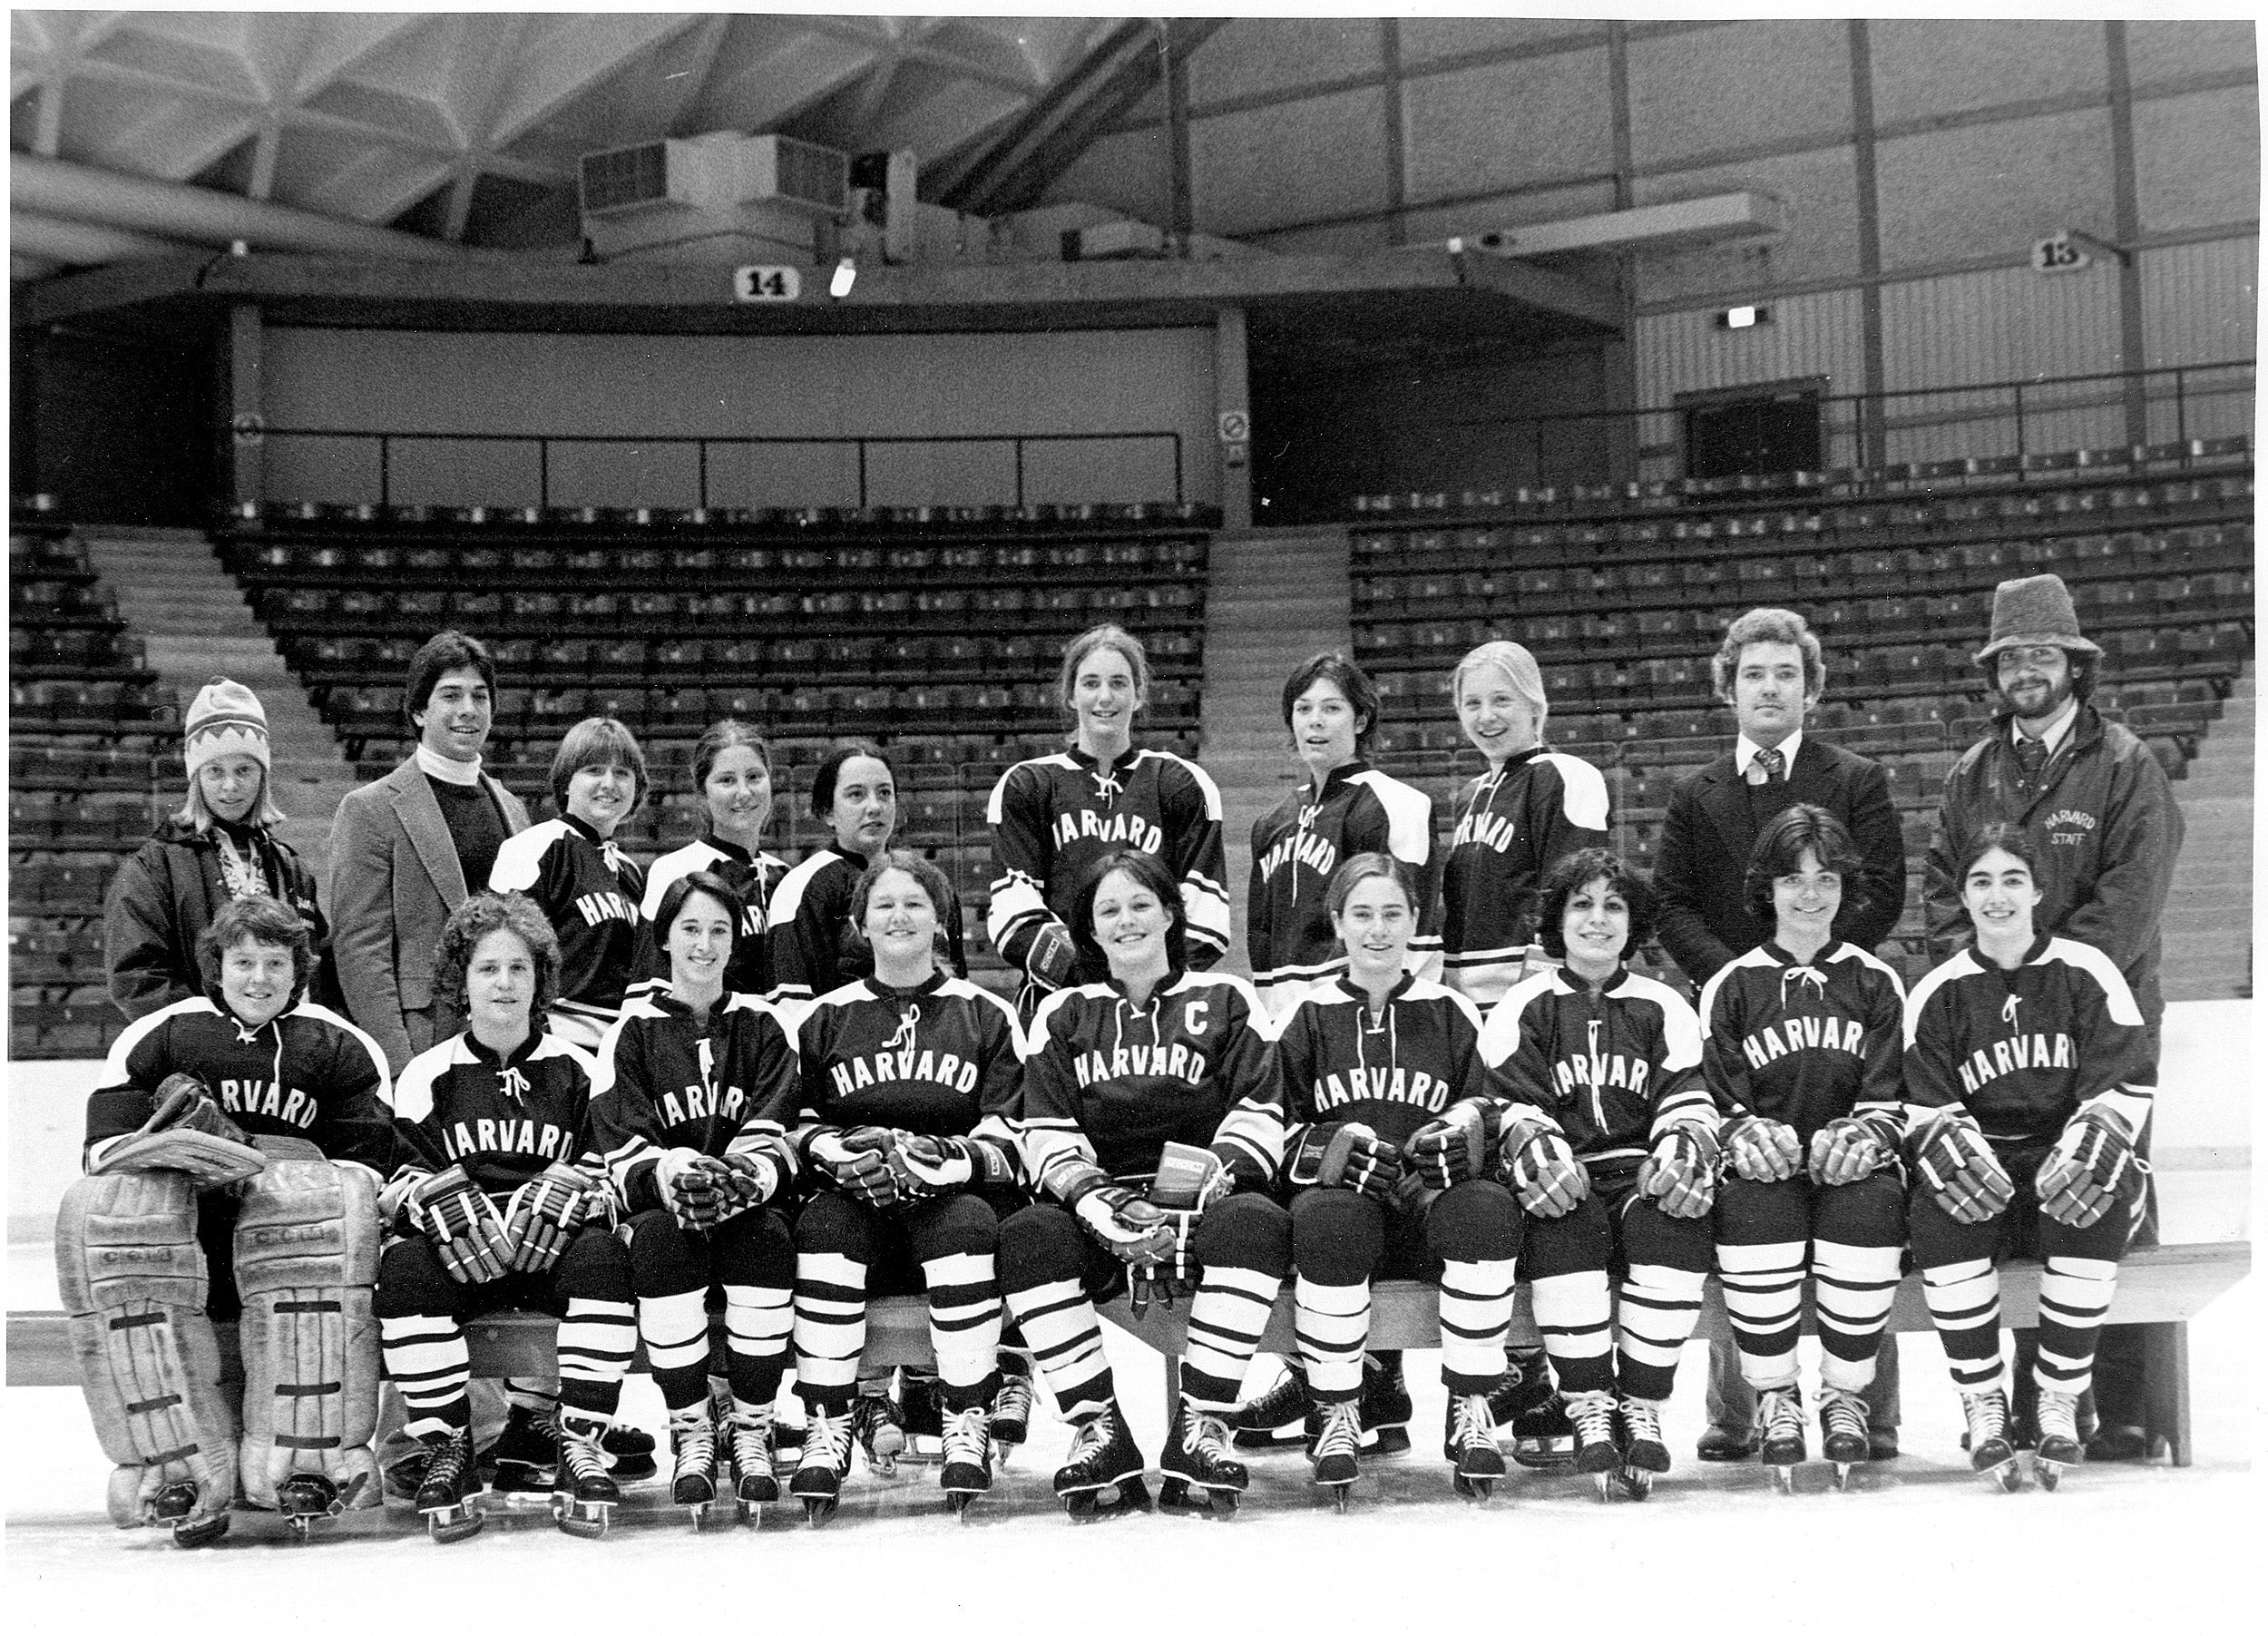 An old photo of the Harvard women's hockey team